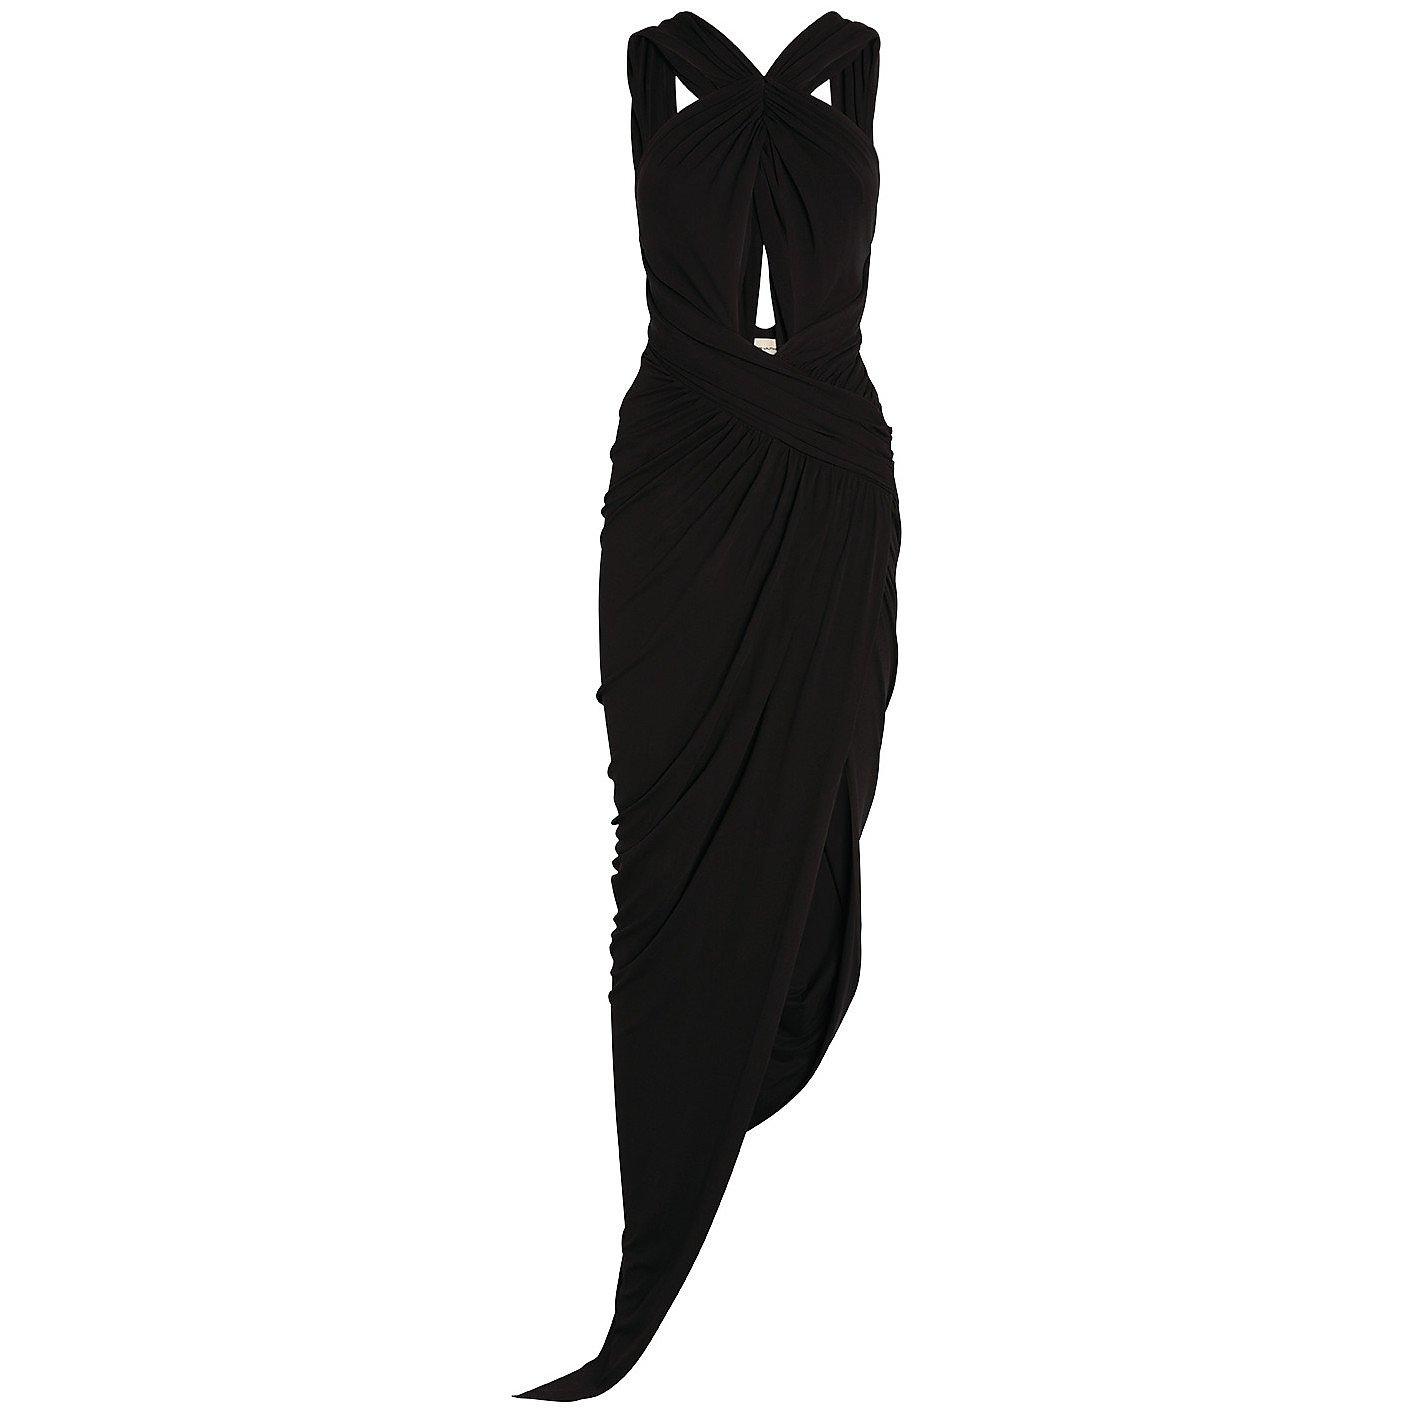 Alexandre Vauthier Open Back Sleeveless Gown